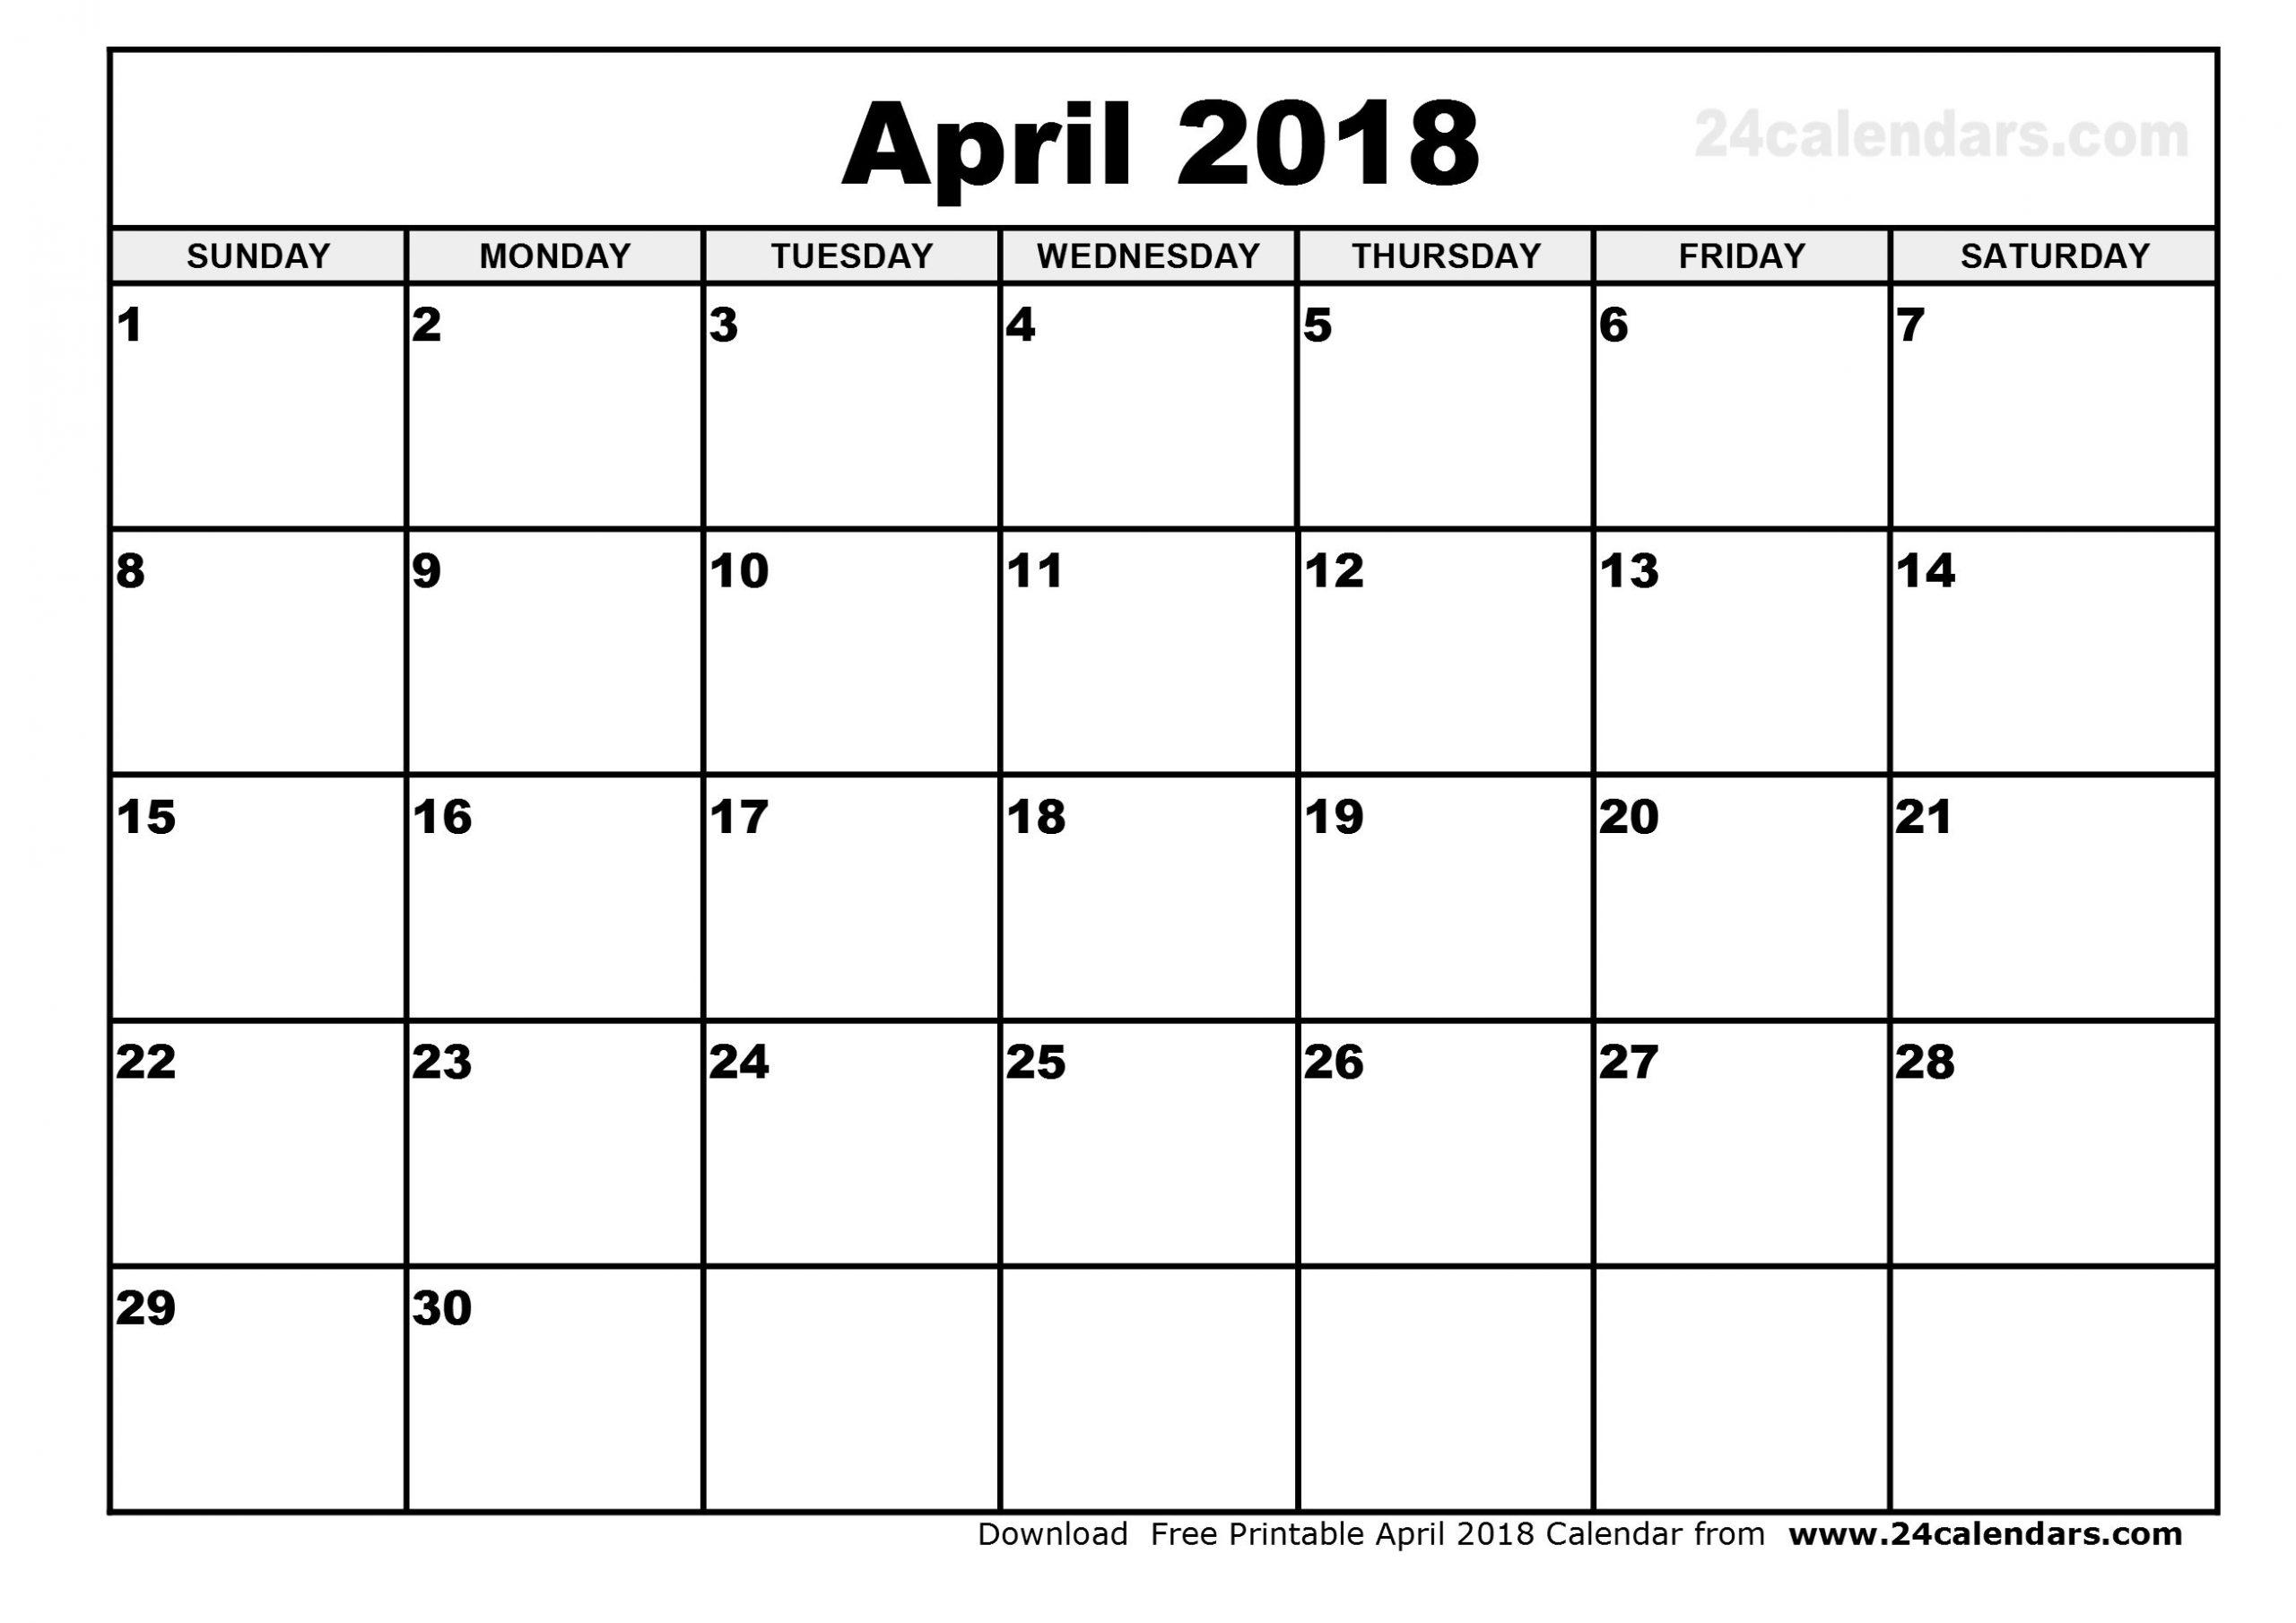 April 2018 Calendar Vertex   Qualads